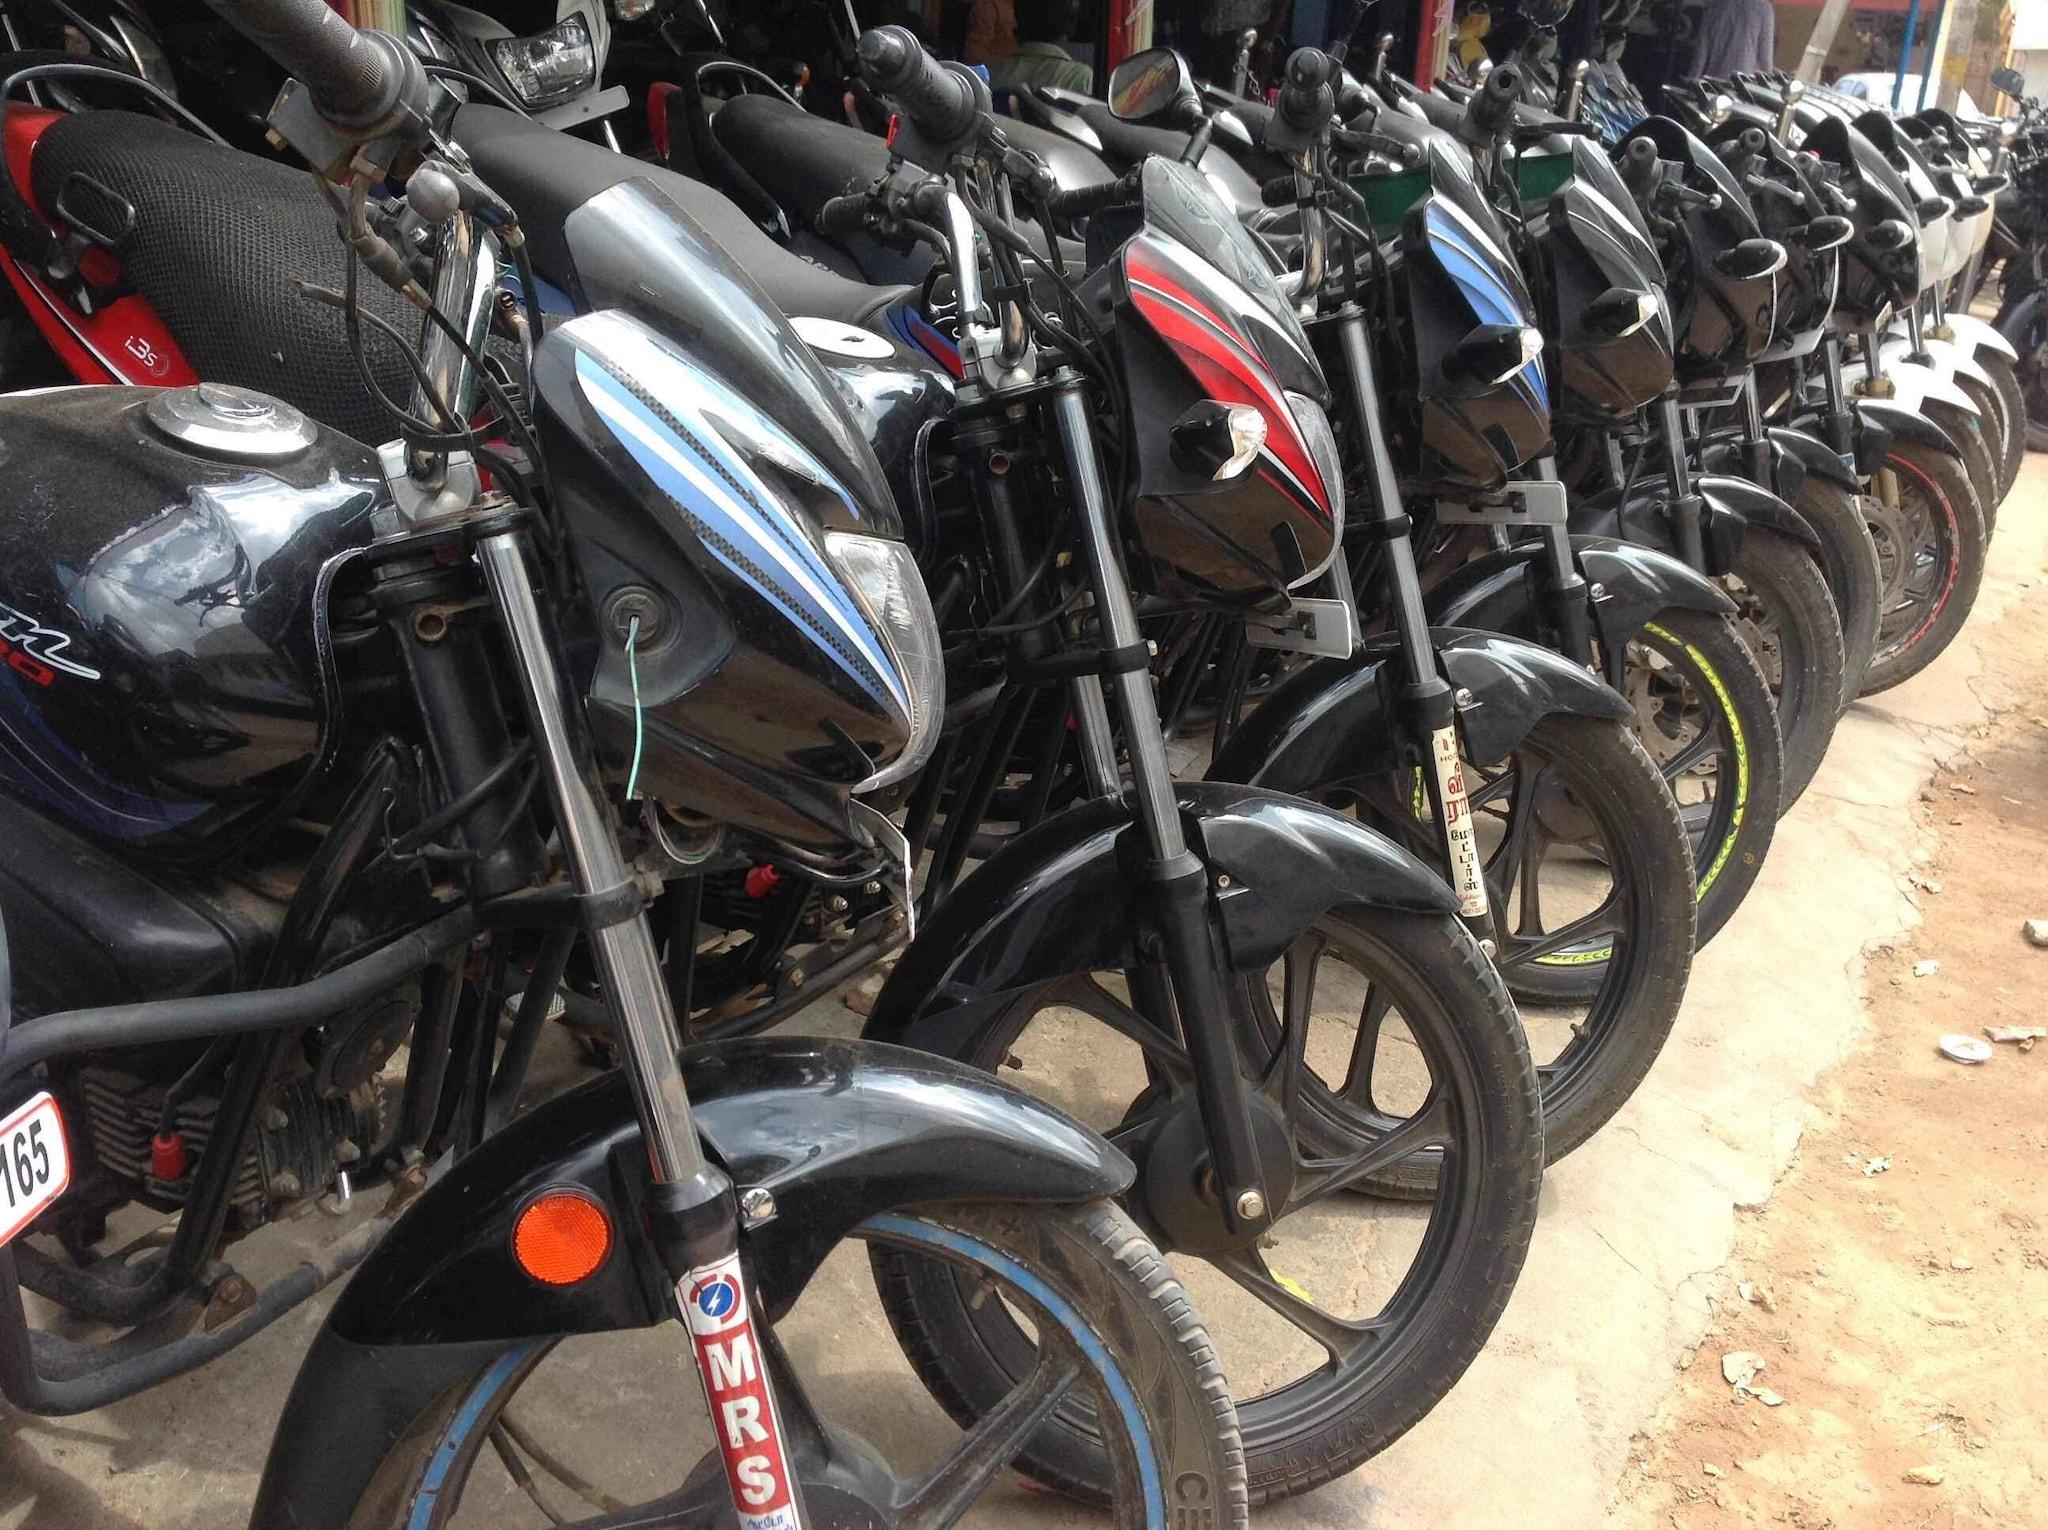 Top 10 Bajaj Showrooms in Manamelkudii - Bajaj Bike Dealers